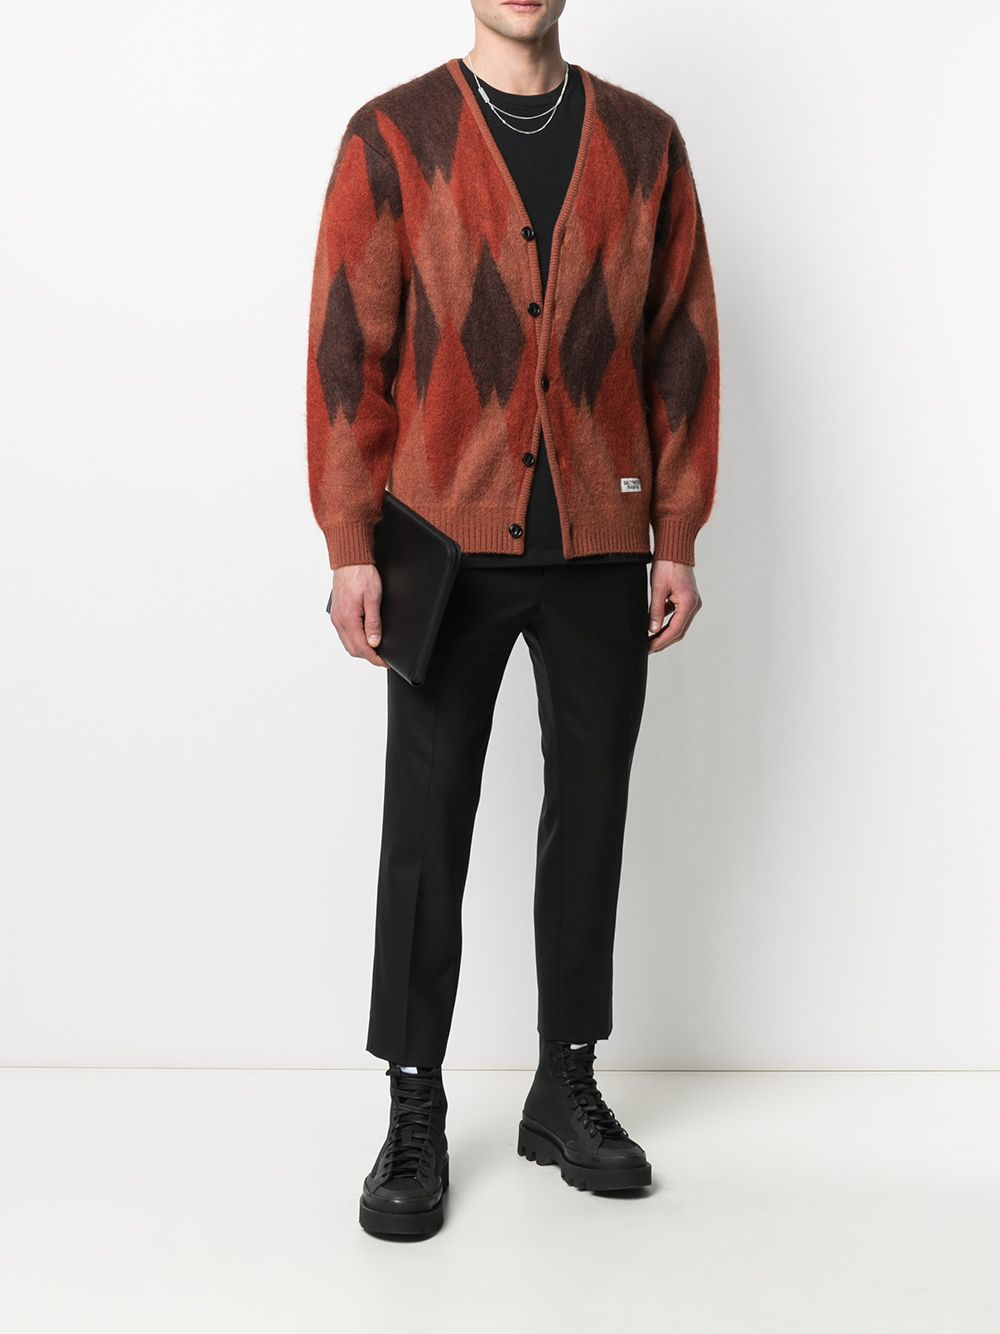 Ami-alexandre mattiussi cropped trousers man AMI - ALEXANDRE MATTIUSSI   Trousers   E21HT206.279001